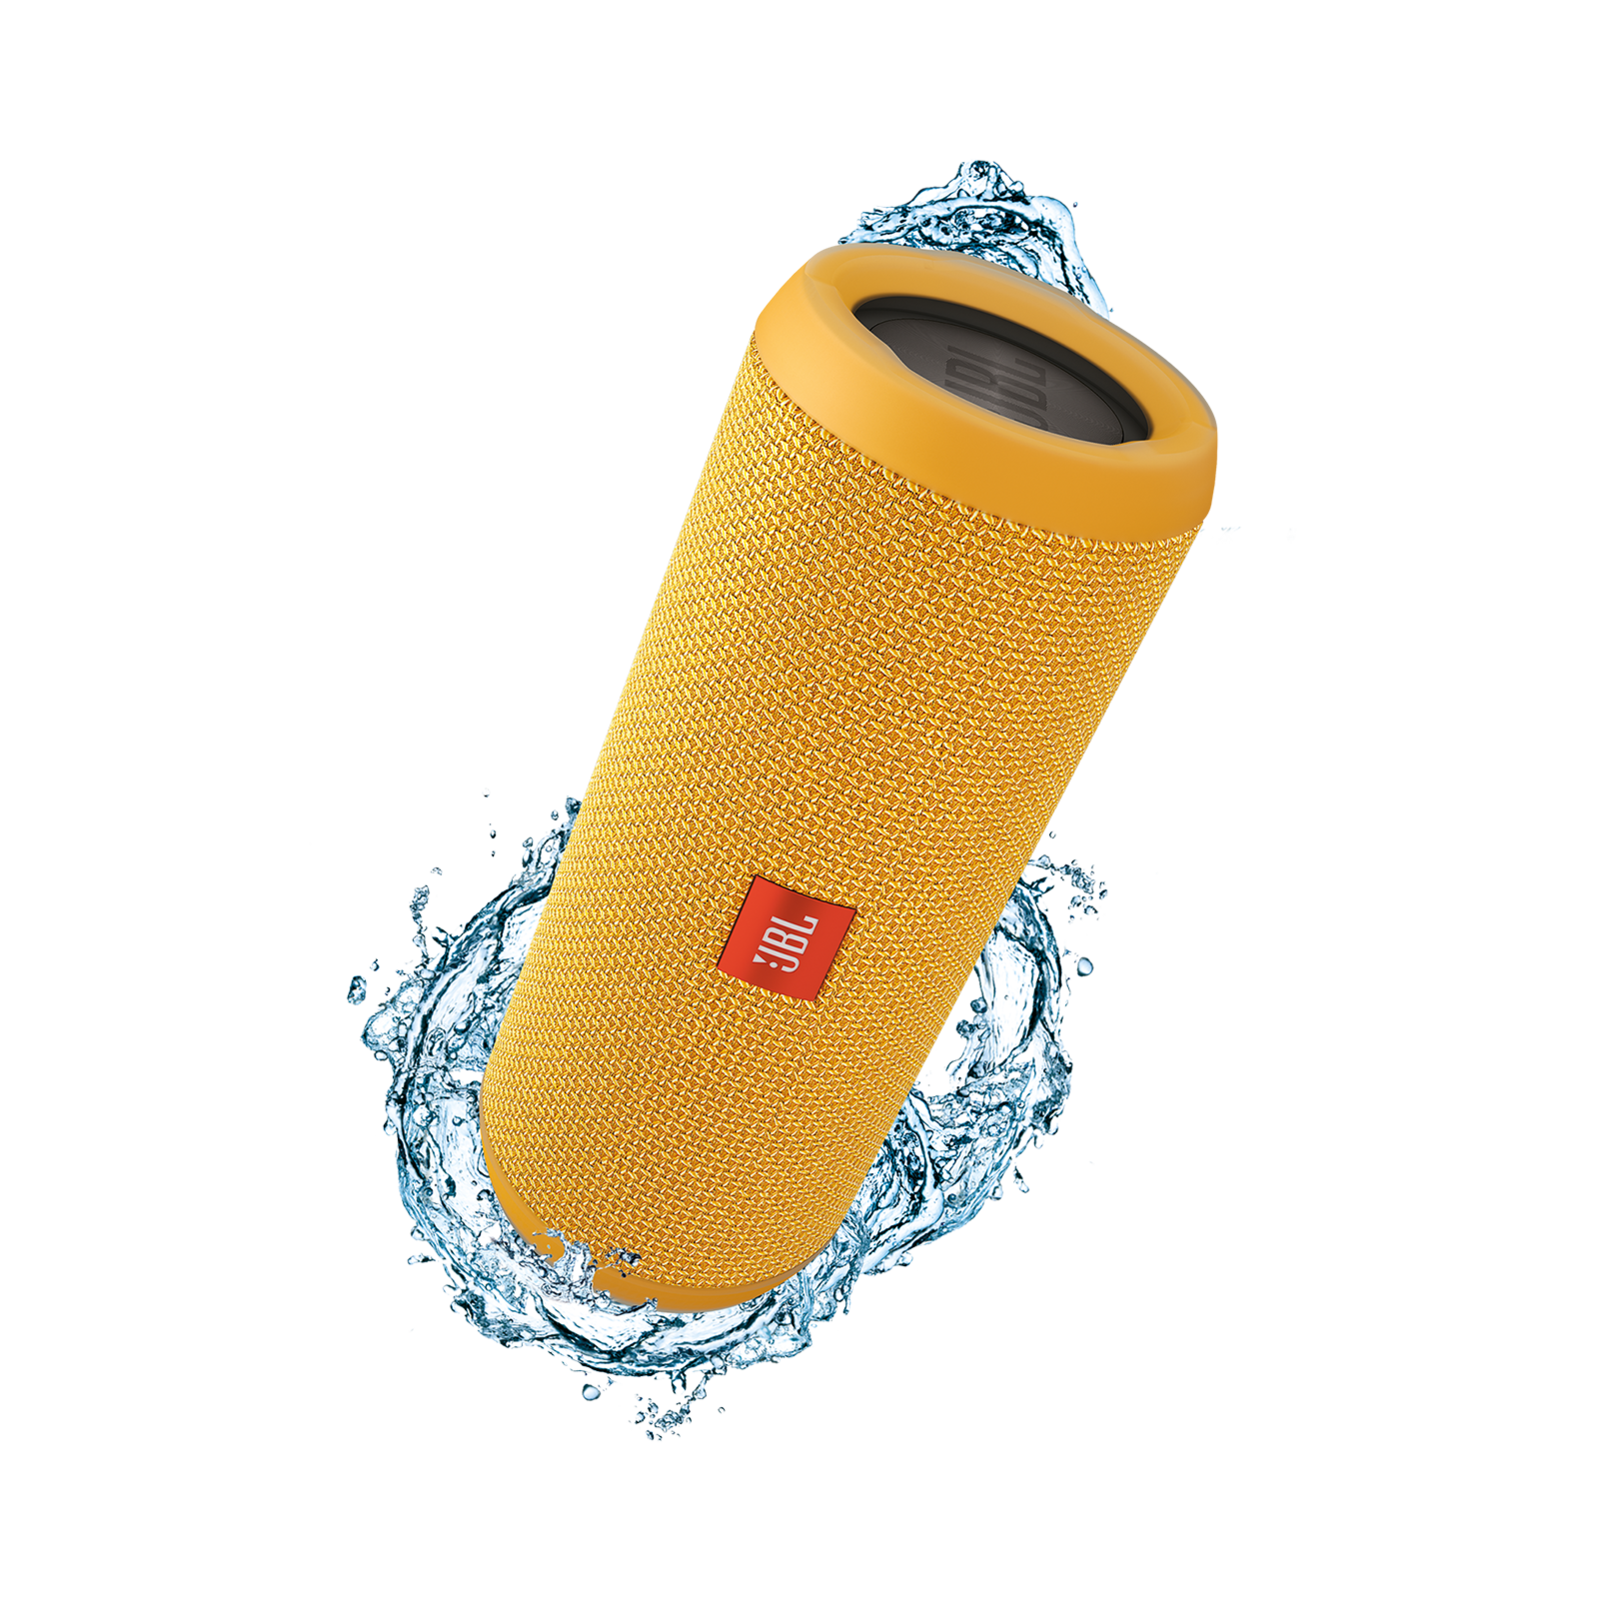 JBL Flip 3 - Yellow - Splashproof portable Bluetooth speaker with powerful sound and speakerphone technology - Hero